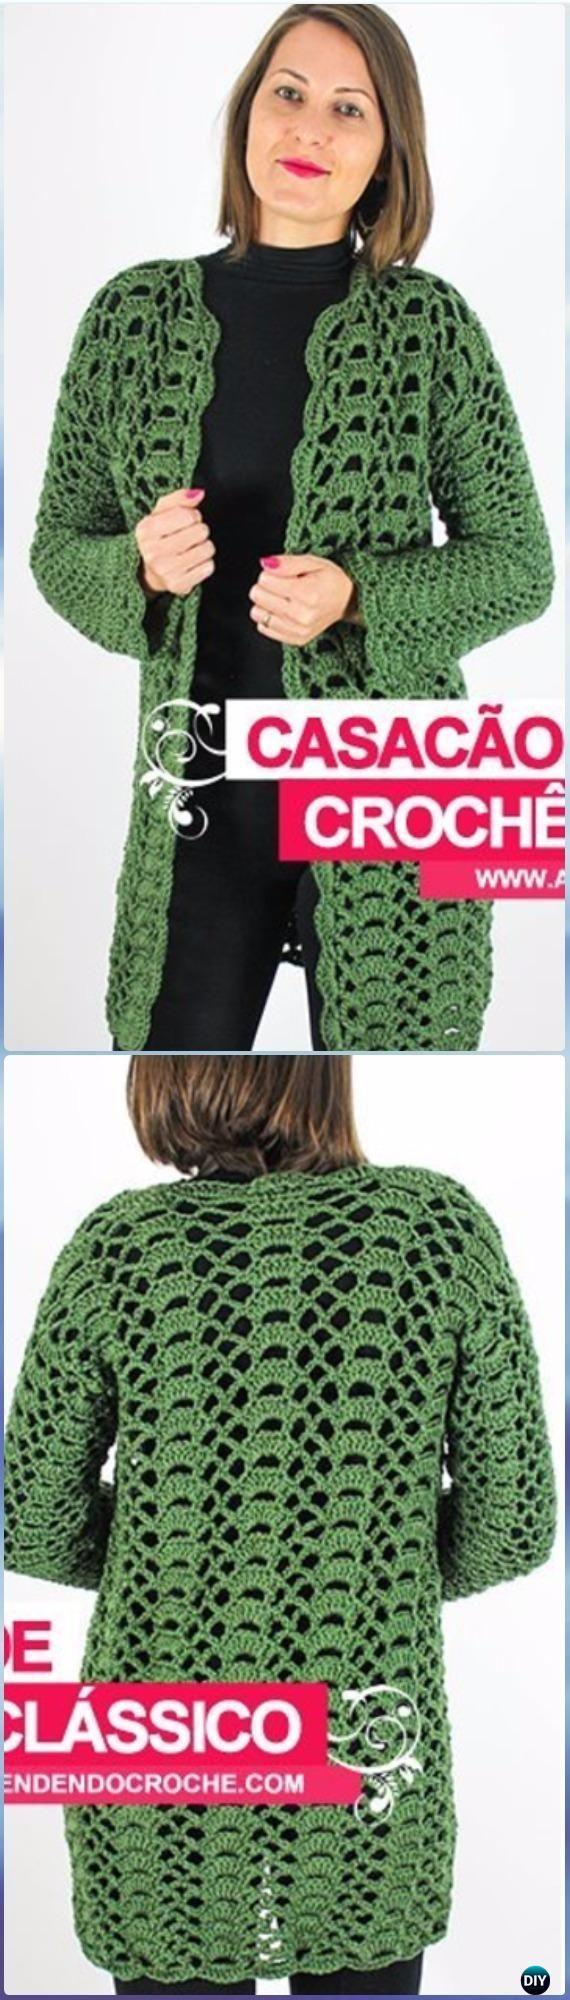 Crochet Classic Sweater Coat Free Pattern Video - Crochet Women Sweater Coat & Cardigan Free Patterns